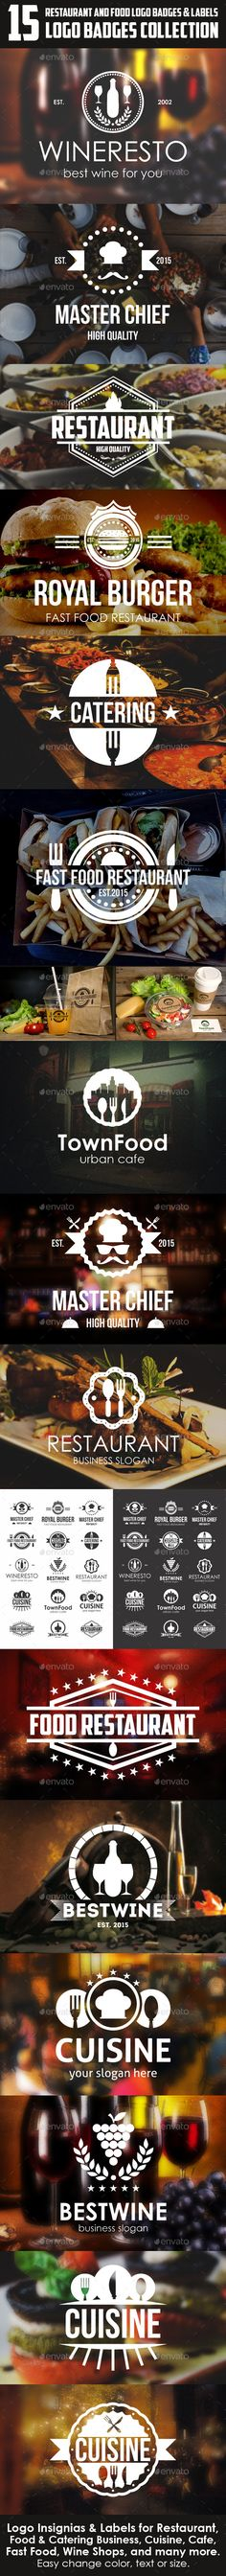 Restaurant and Food Logo Badges & Labels Template #design Download: http://graphicriver.net/item/restaurant-and-food-logo-badges-labels/12188569?ref=ksioks